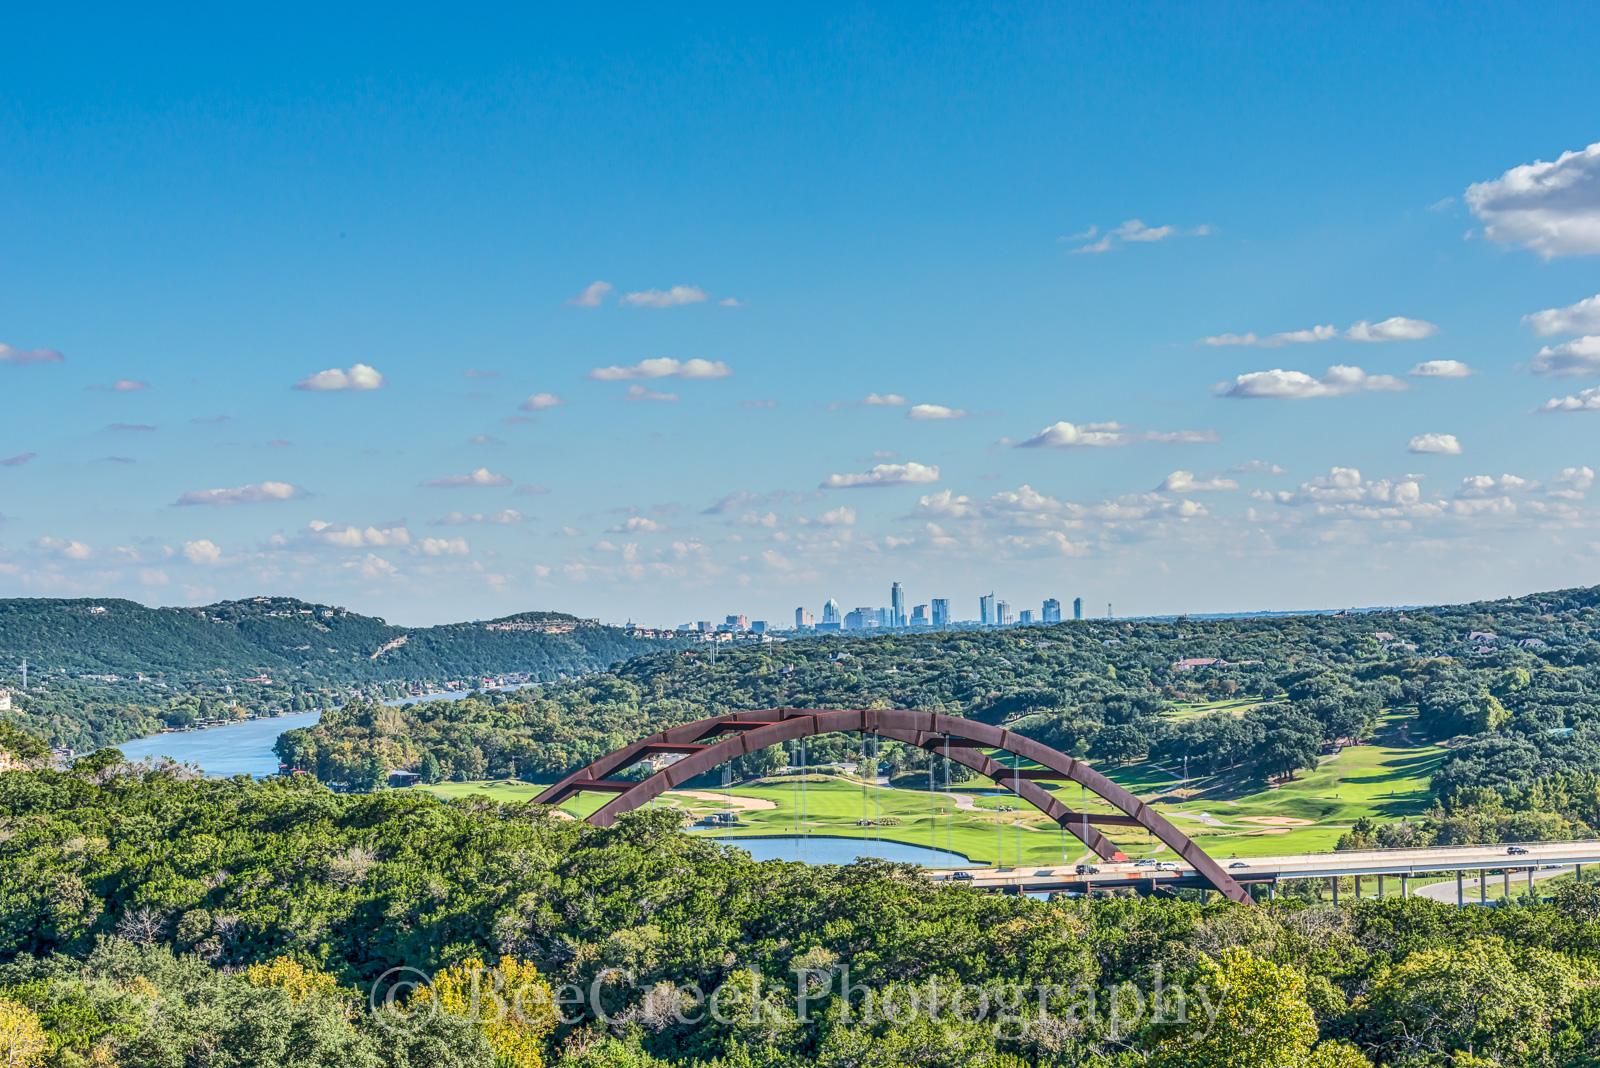 360 overlook, Austin, city, skyline, bridge, penny backer bridge, Austin 360 bridge, urban, river, landscape, water, Texas, downtown, scenic, Pennybacker Bridge, Austin, city landscapes, bridge, photo, photo